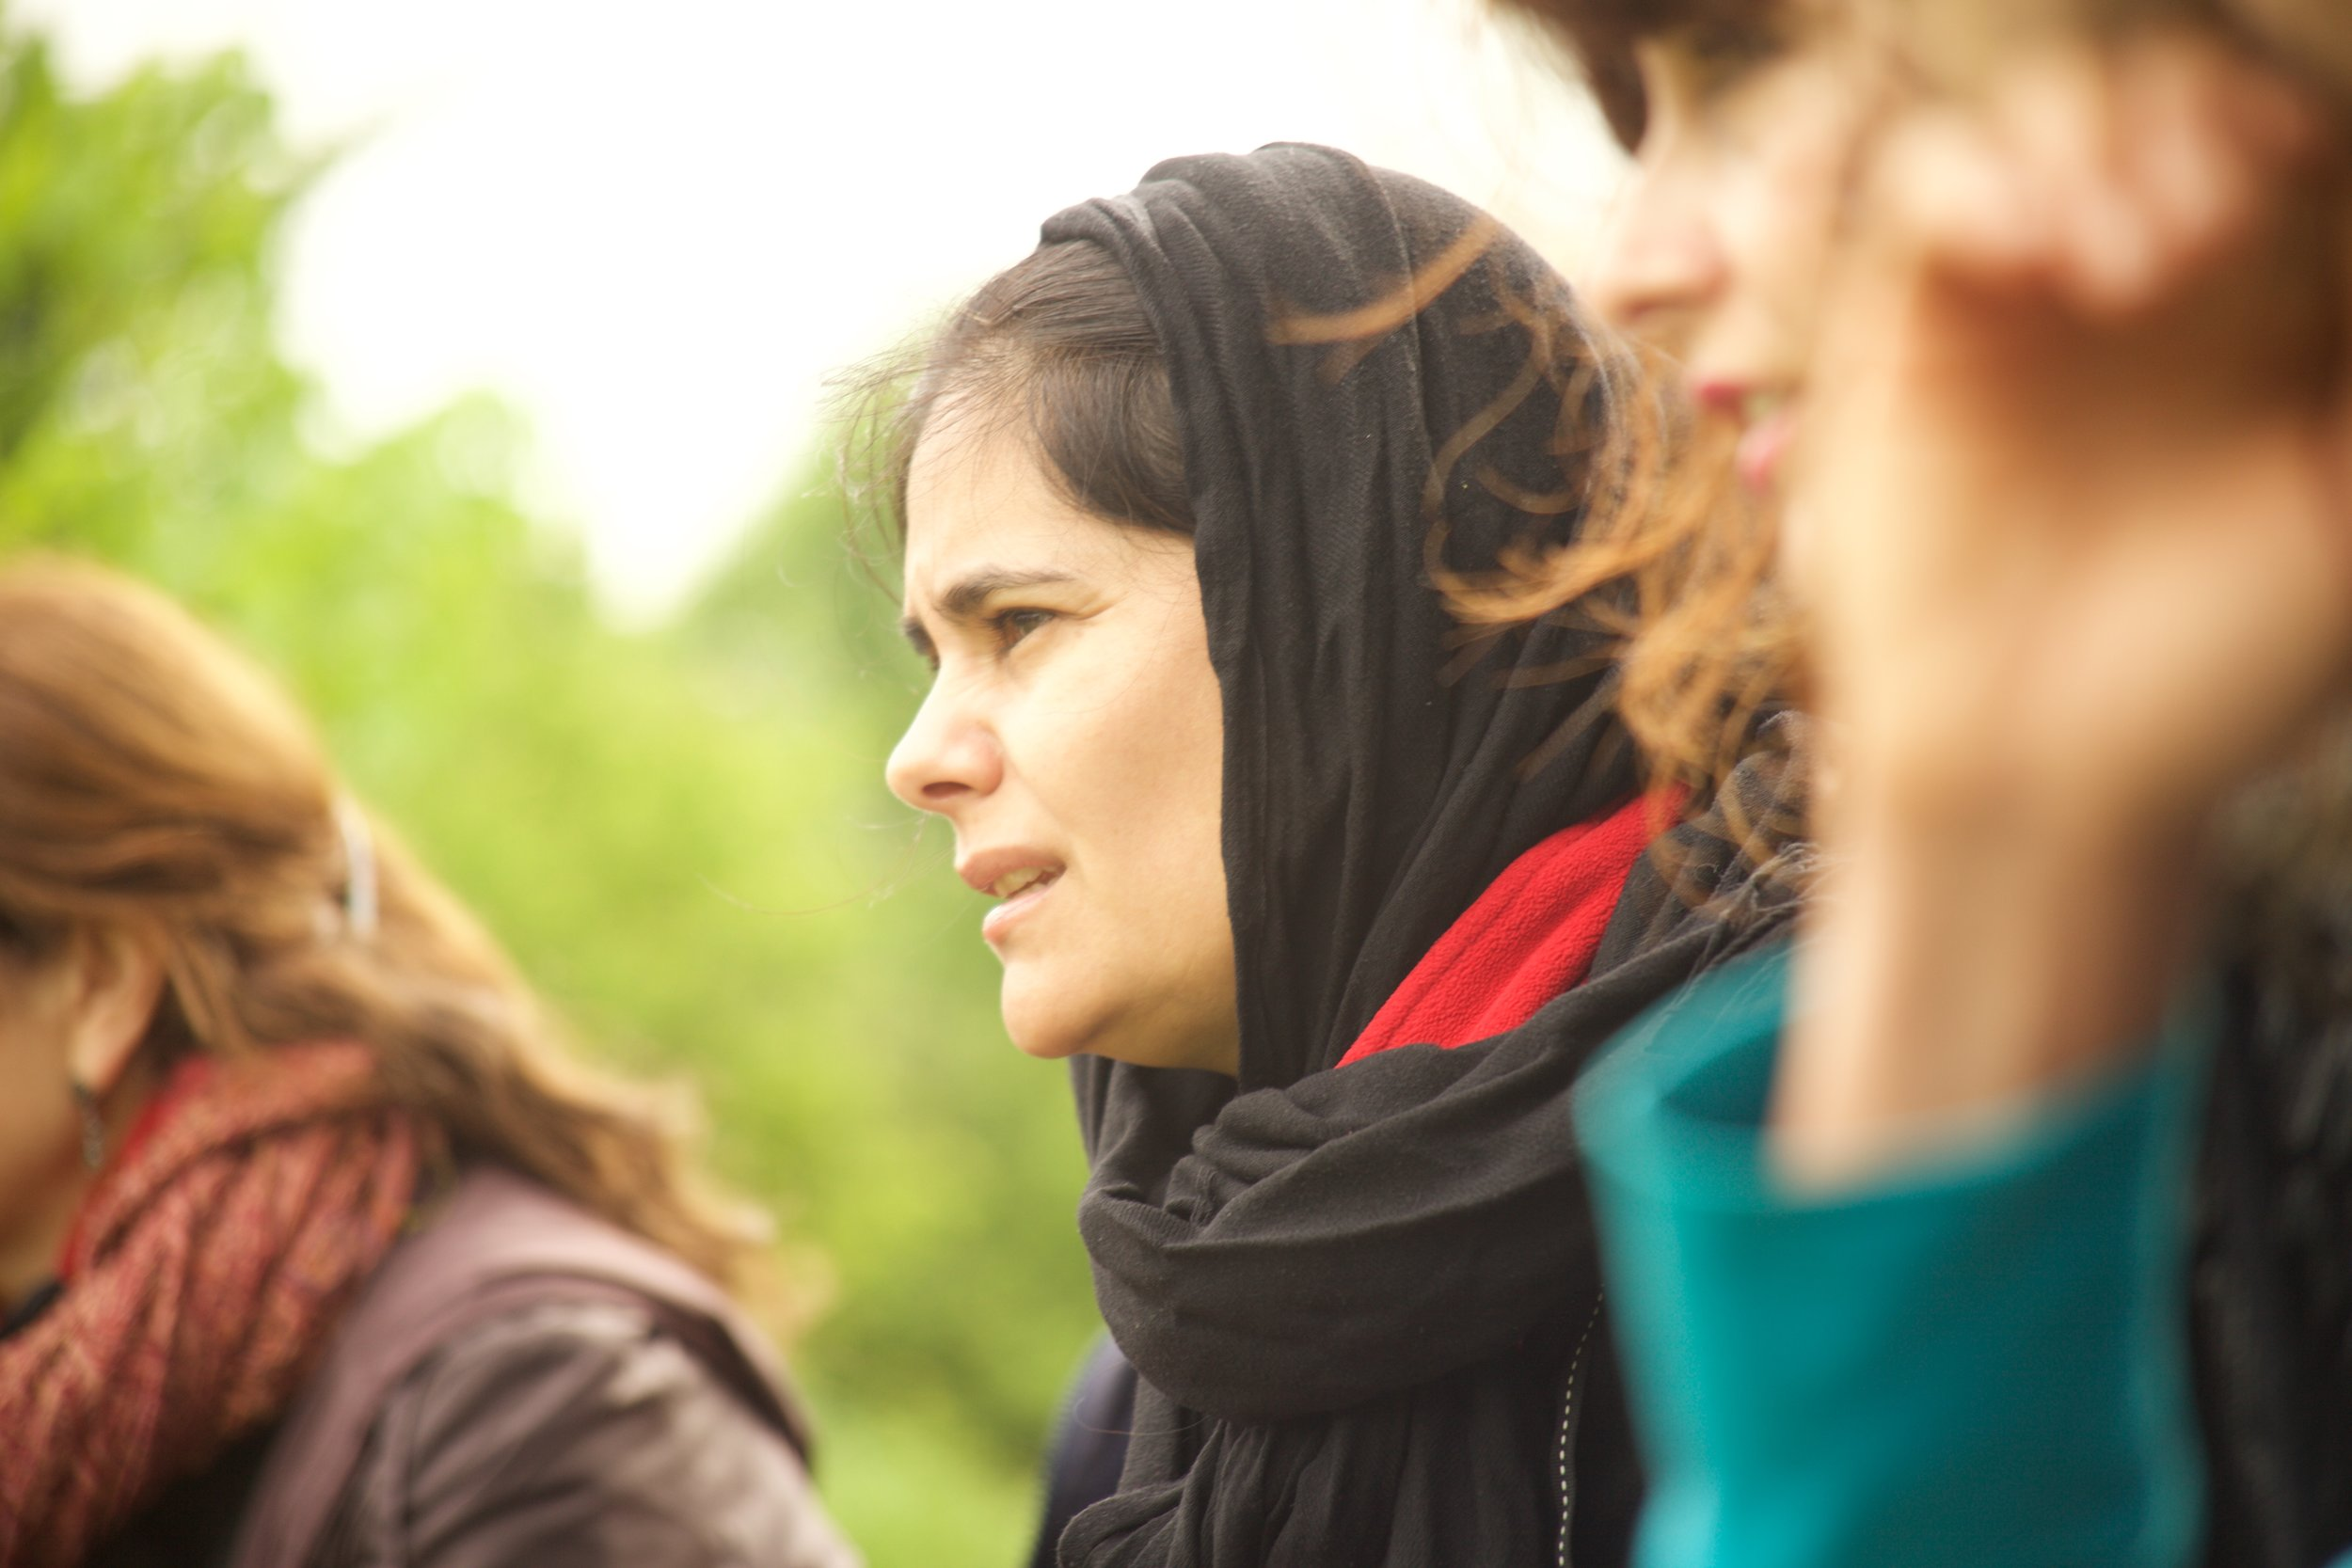 Global Love School Participant